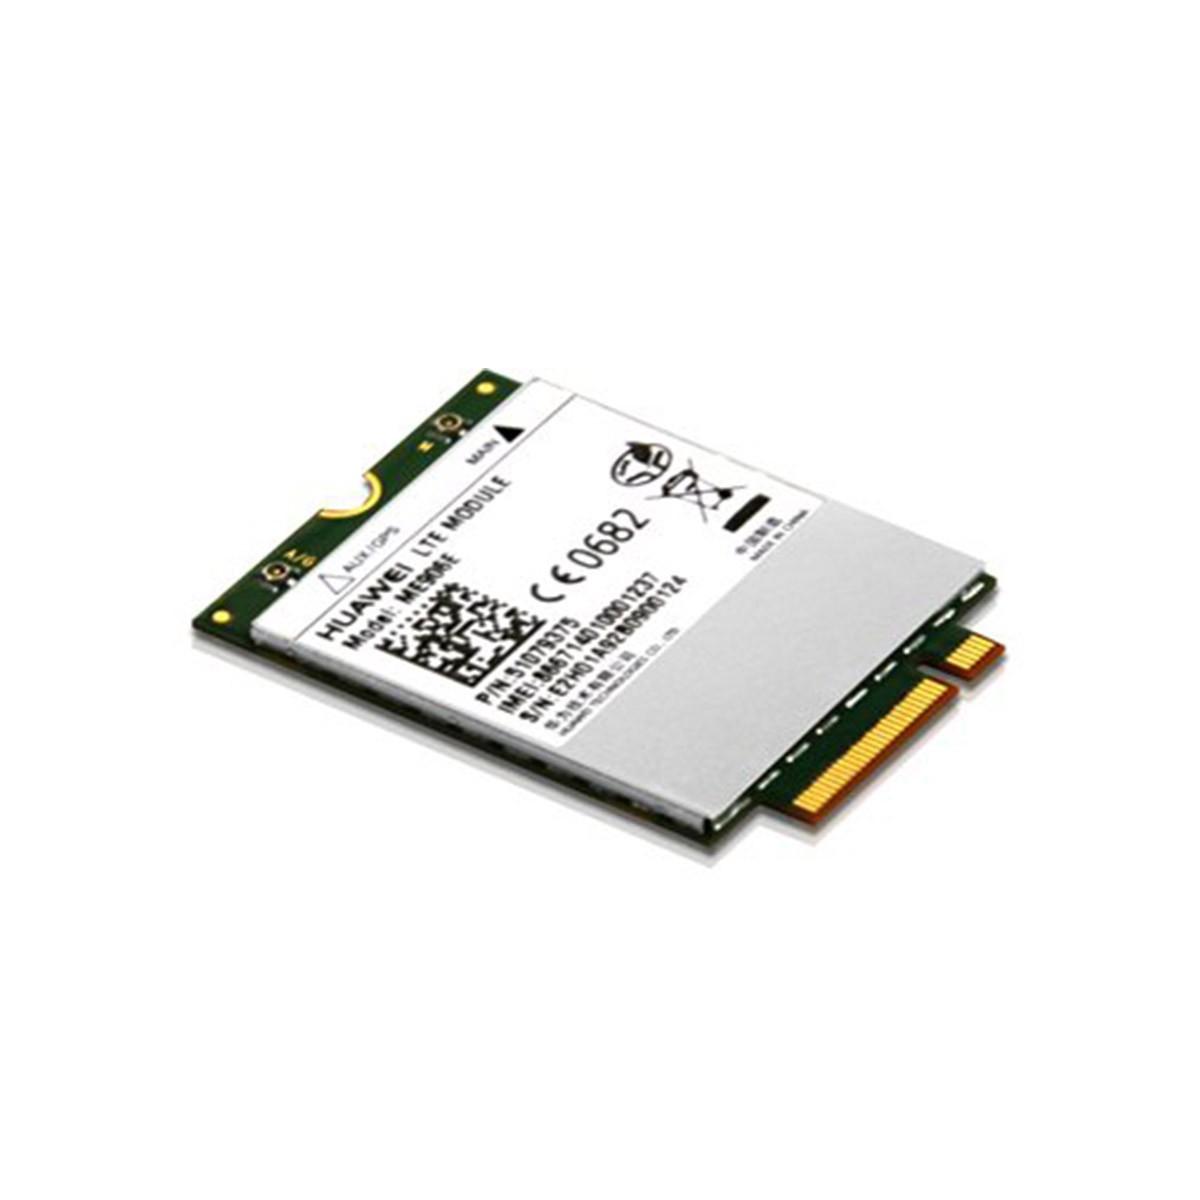 (EOL) Lenovo™ ThinkPad® Huawei ME906S 4G LTE Mobile Broadband